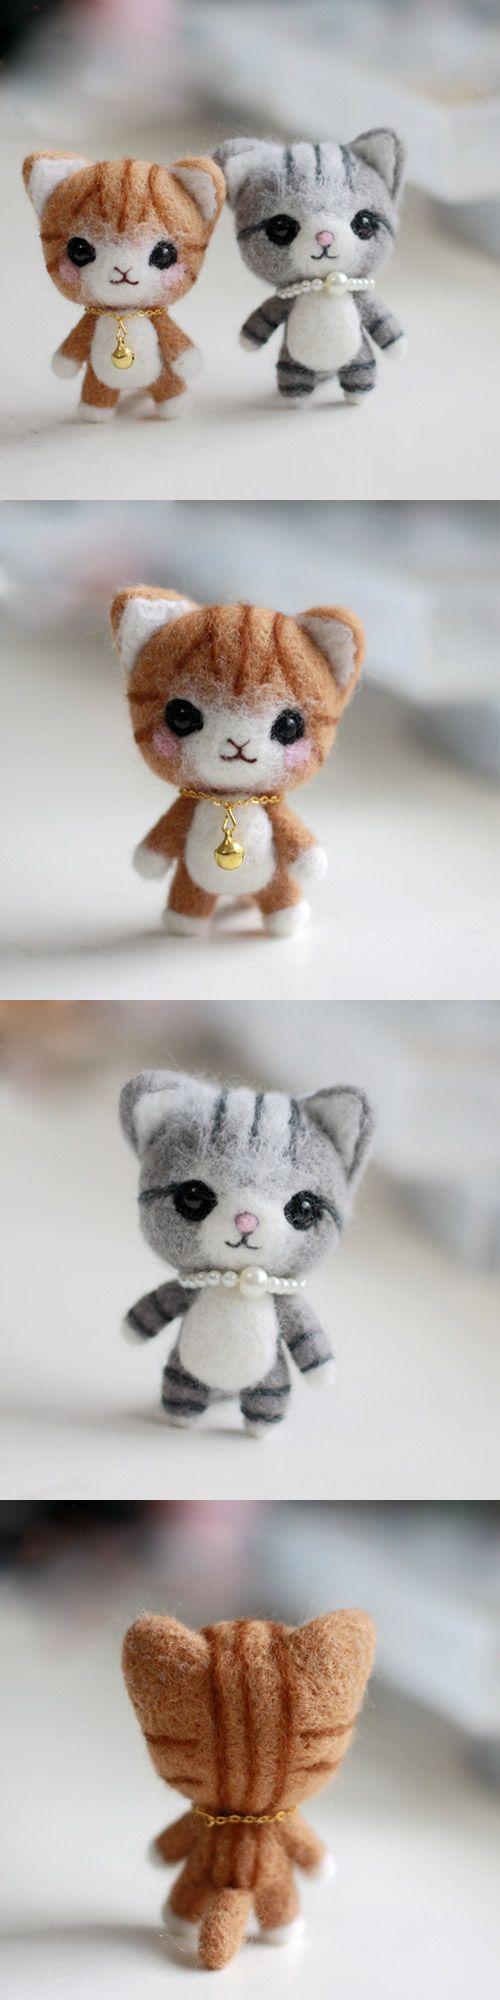 Handmade Needle felted felting project animal cute cat kitten felted wool doll